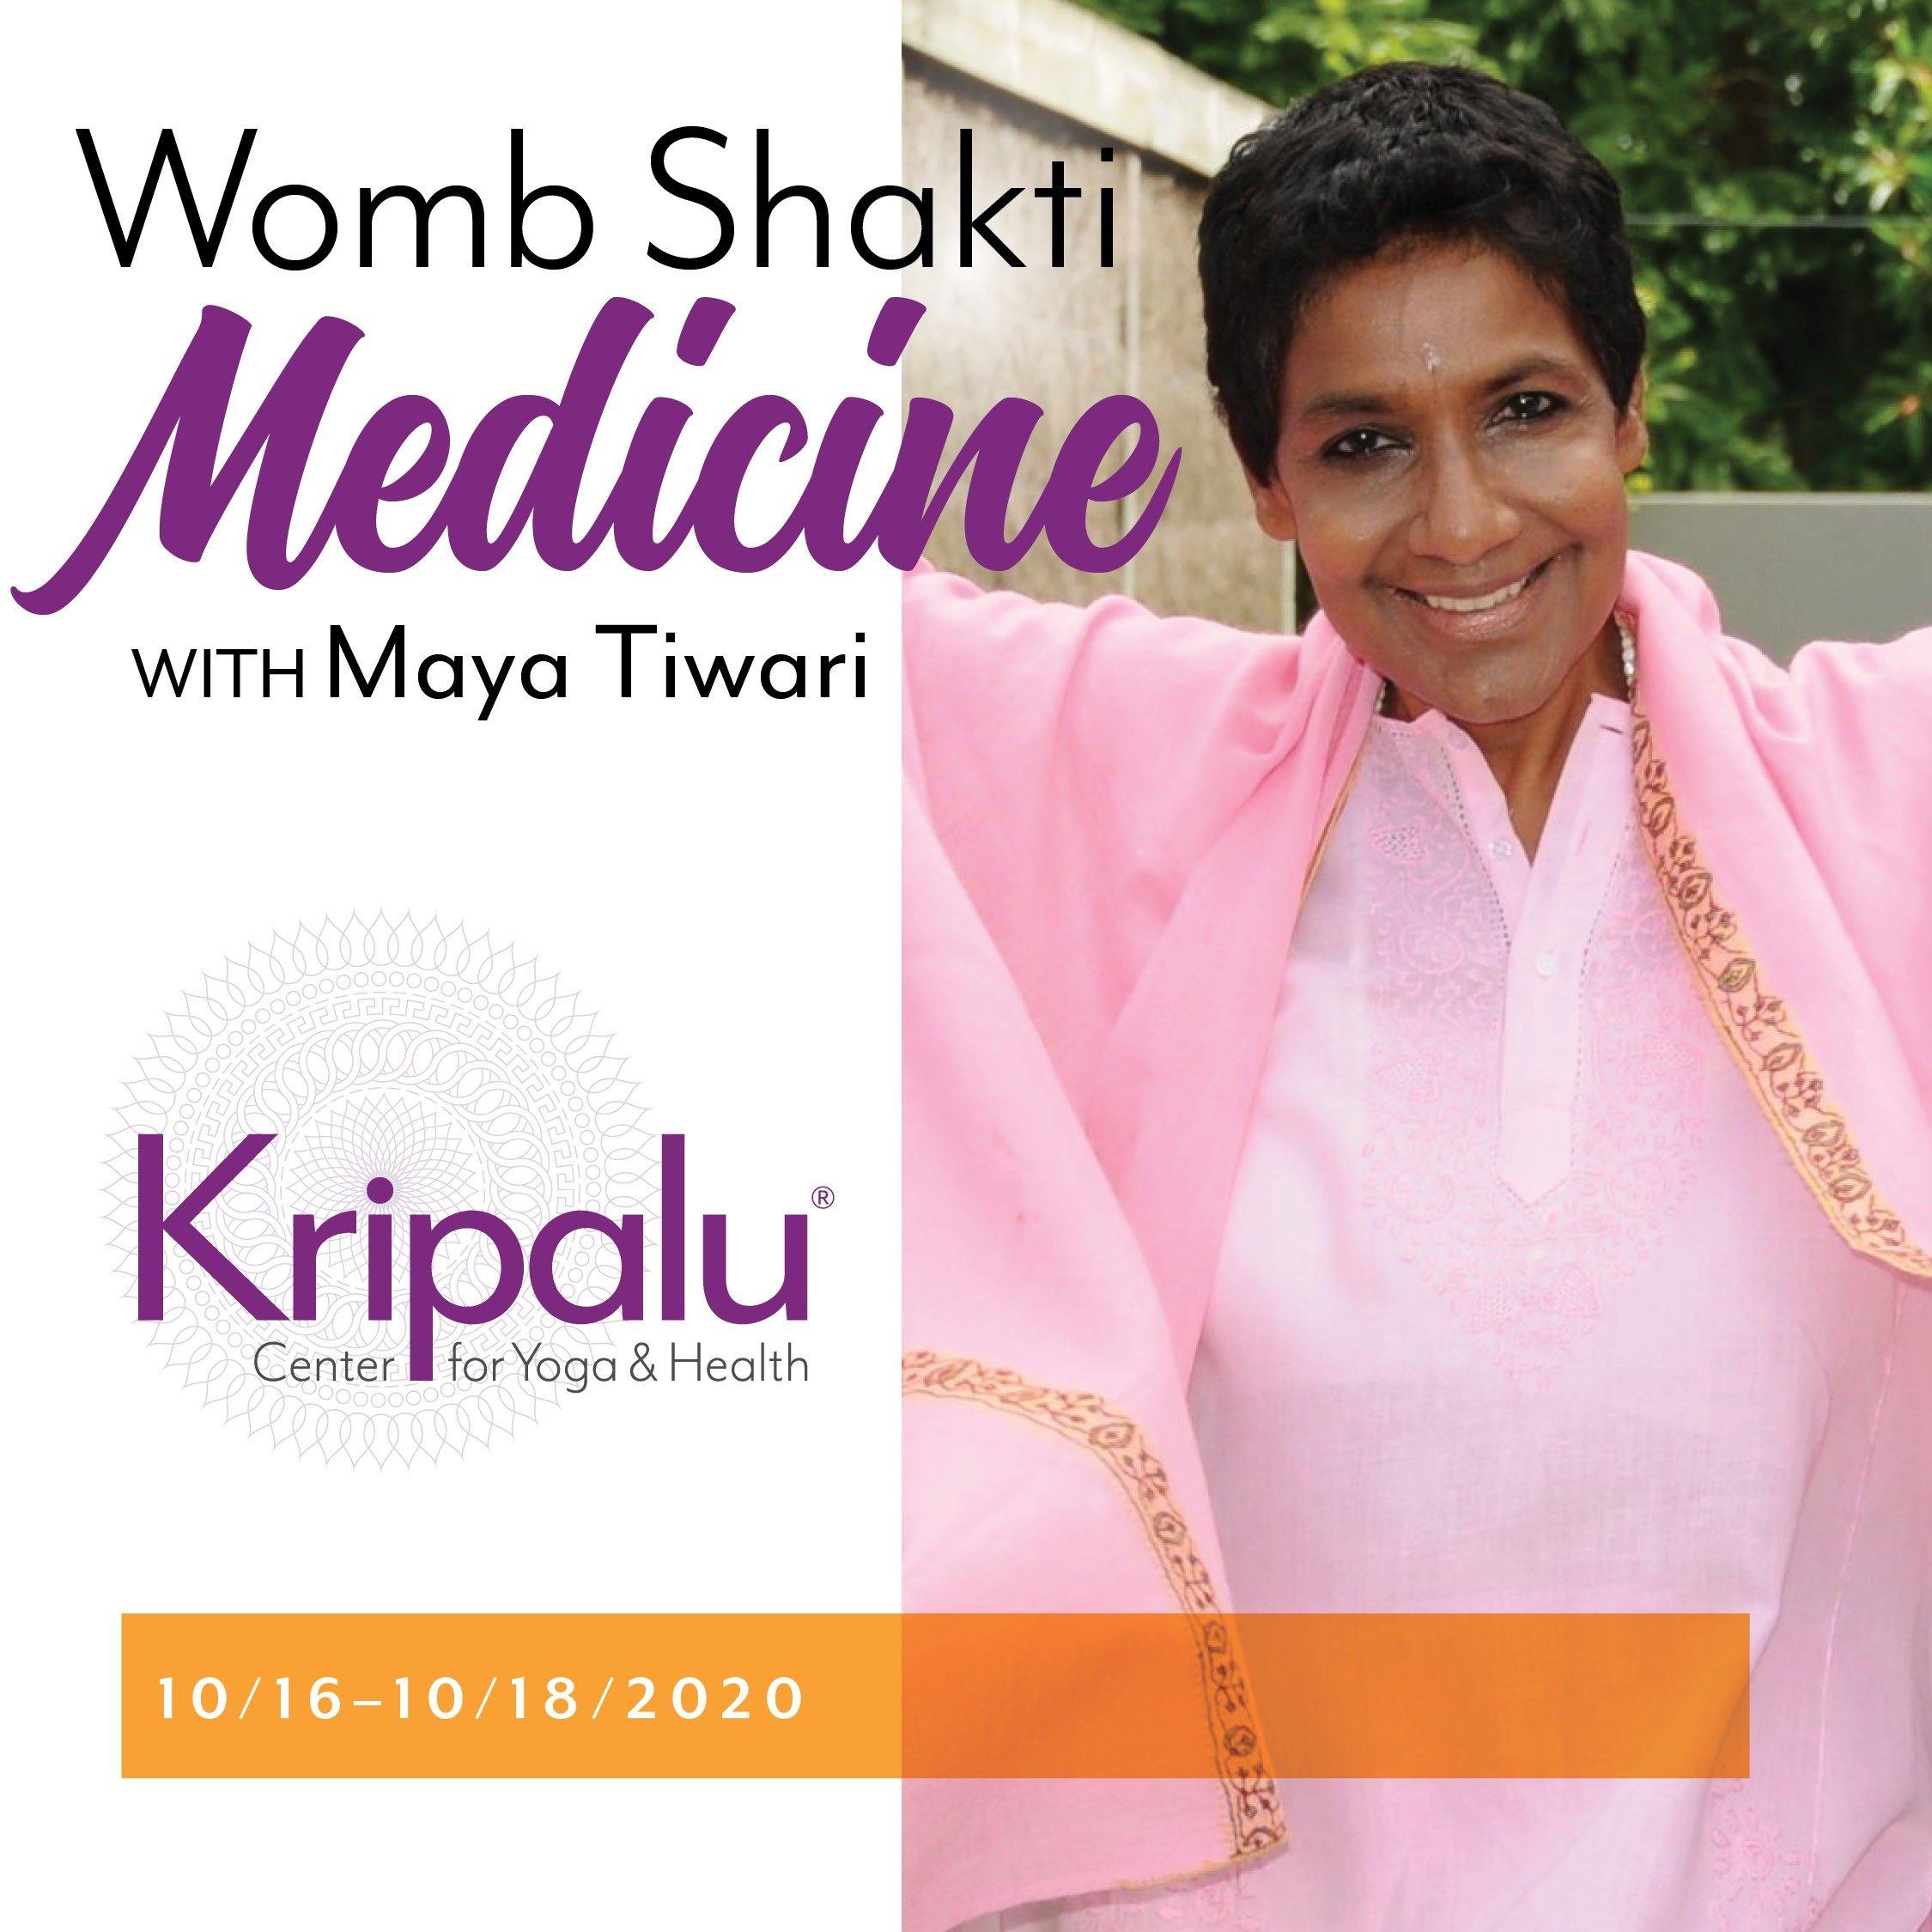 Womb Shakti Medicine